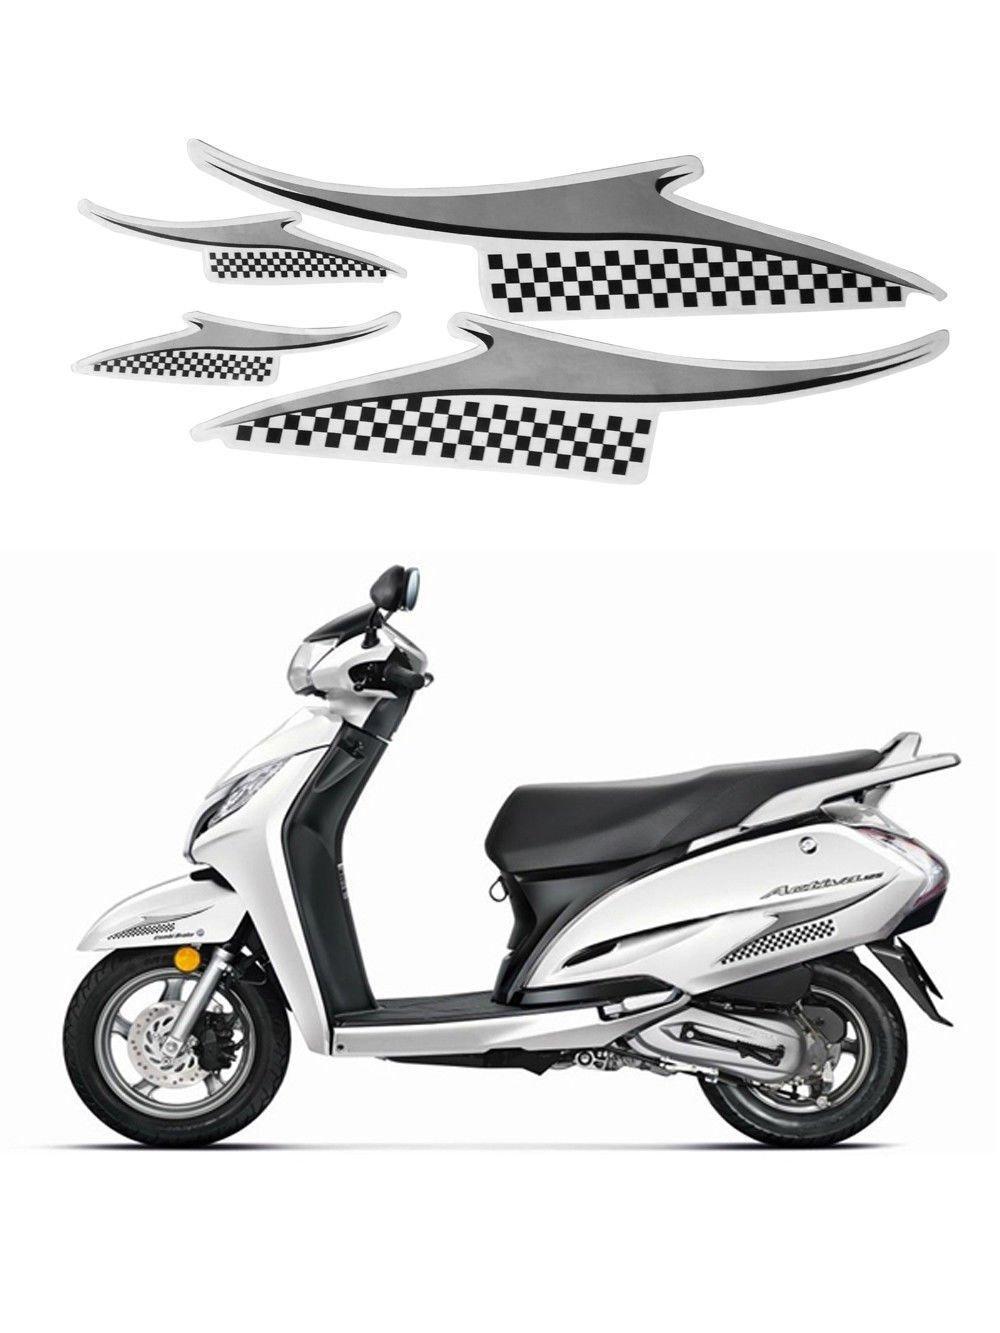 1 Set Scooter Graphics 2 Side Decal Grey Sticker For Honda Dio Bike Stickers Design Car Motorbike